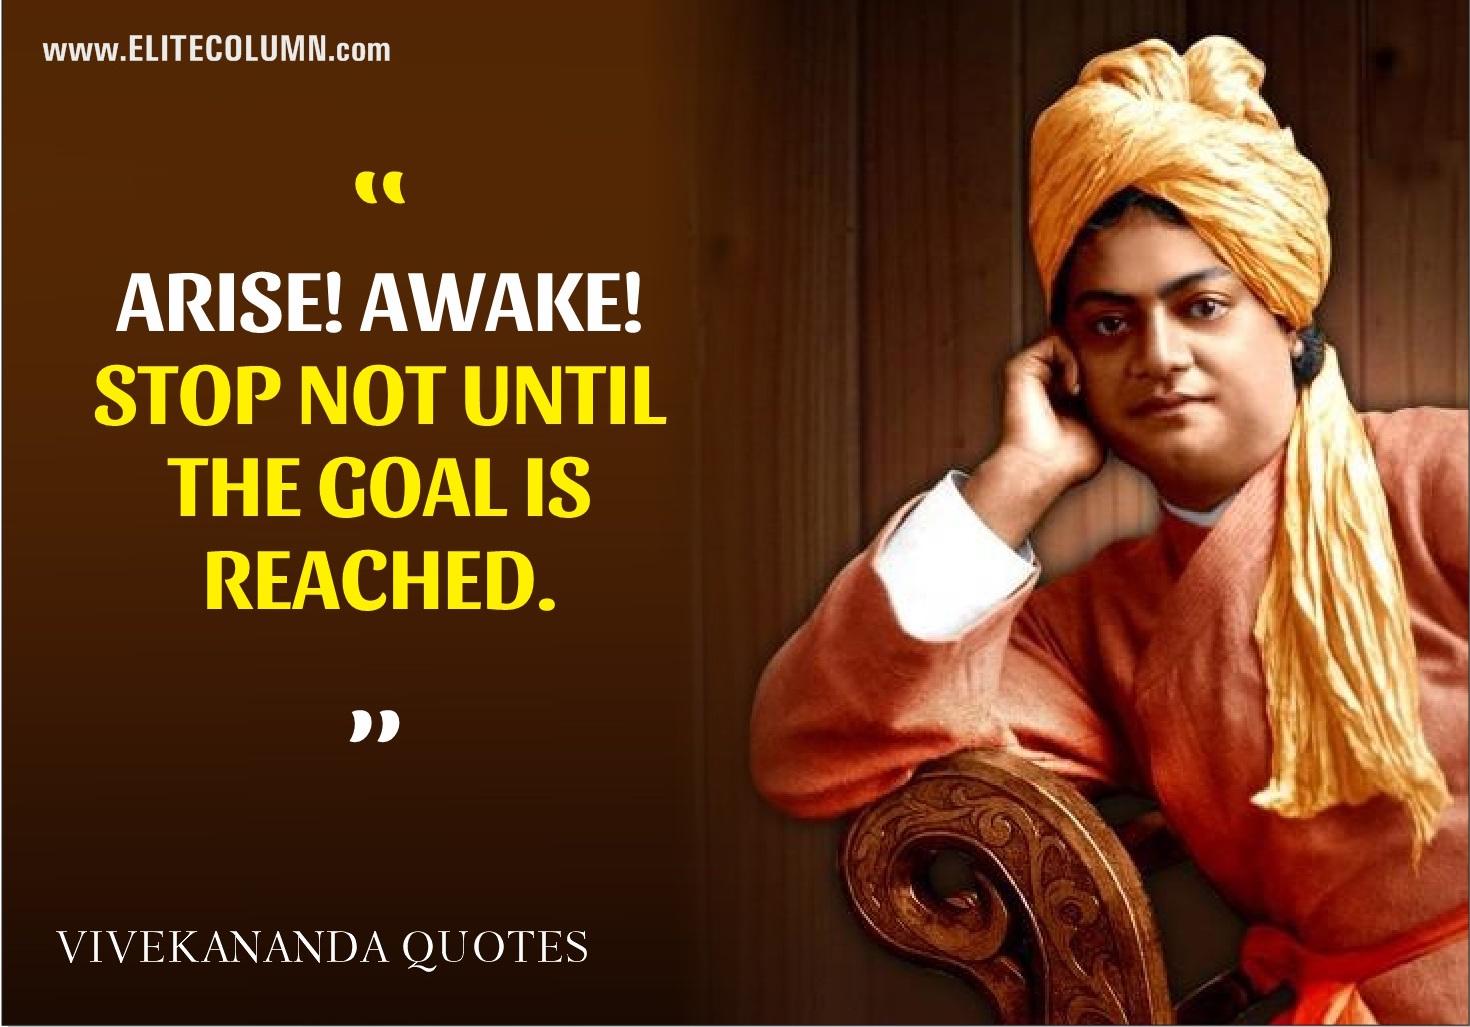 Vivekananda Quotes (1)